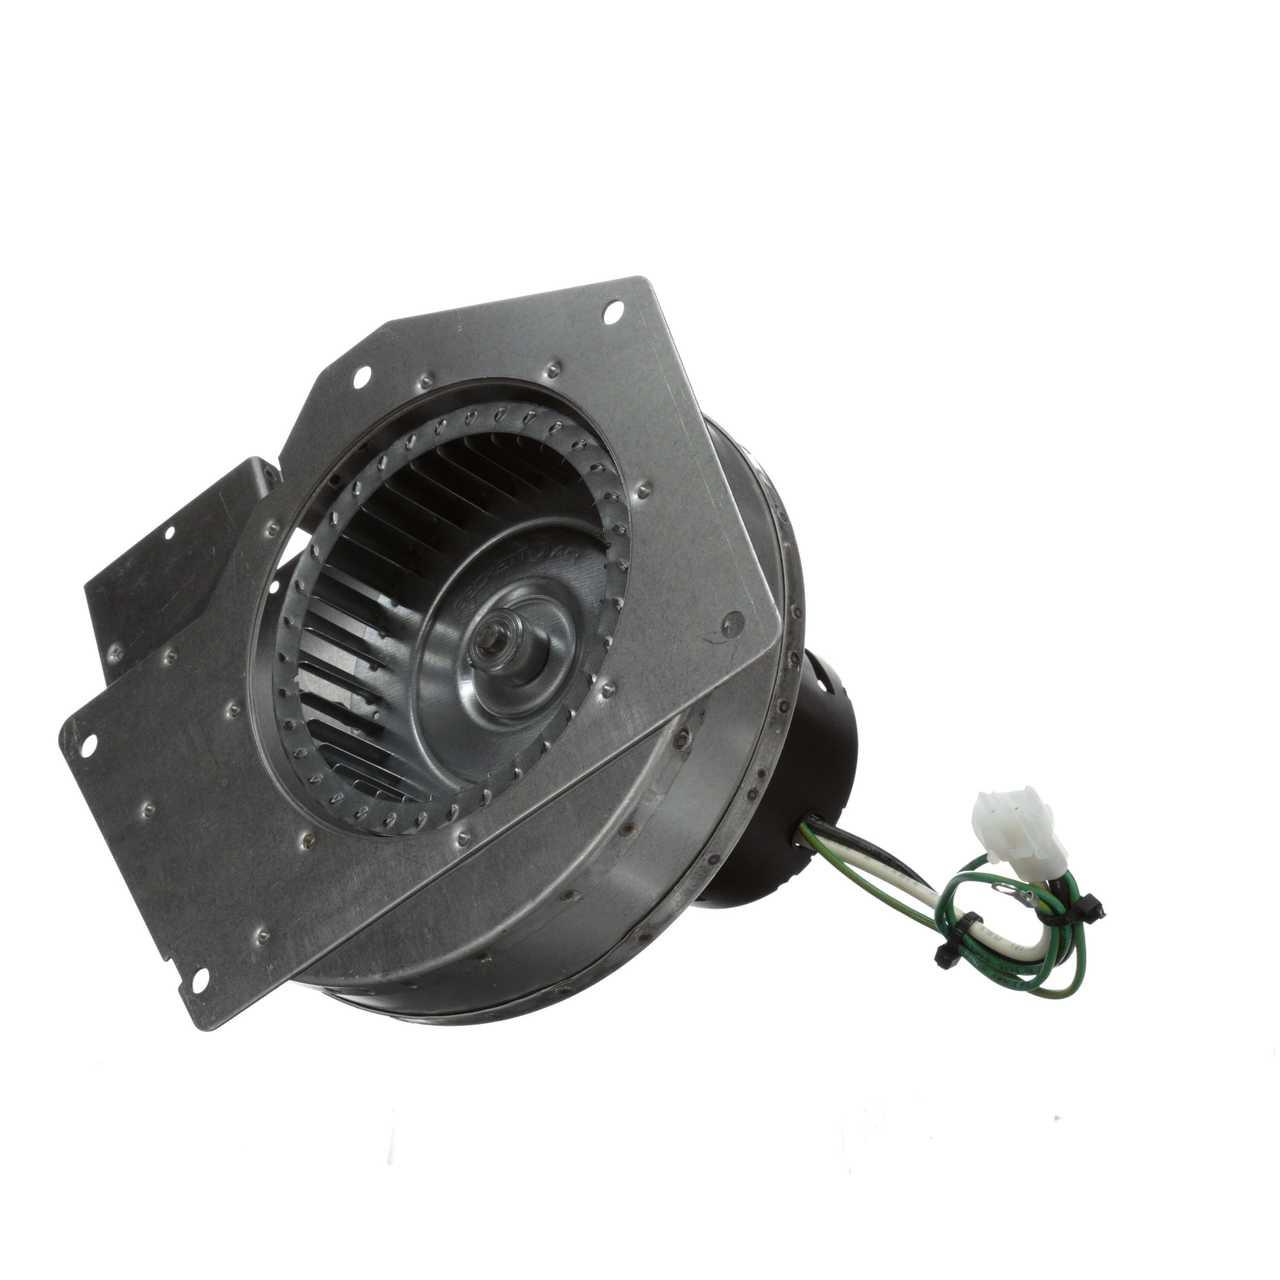 fasco a143 trane furnace draft inducer blower jakel j238 138 1344 115v